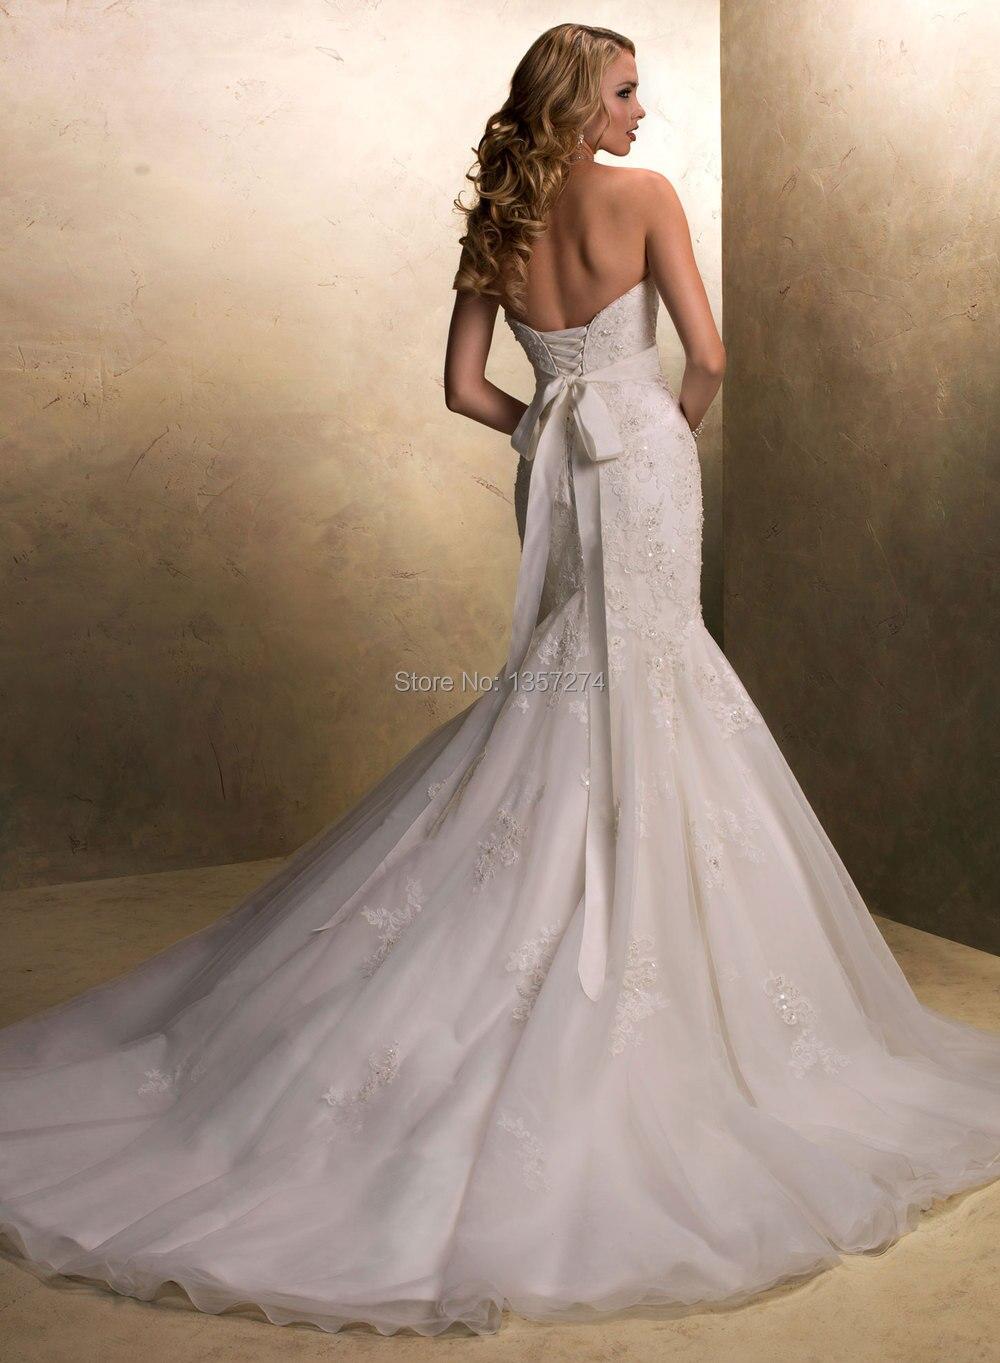 Hot Sale 2014 Fashion Cinderella Wedding Dresses Sweetheart Low Back ...